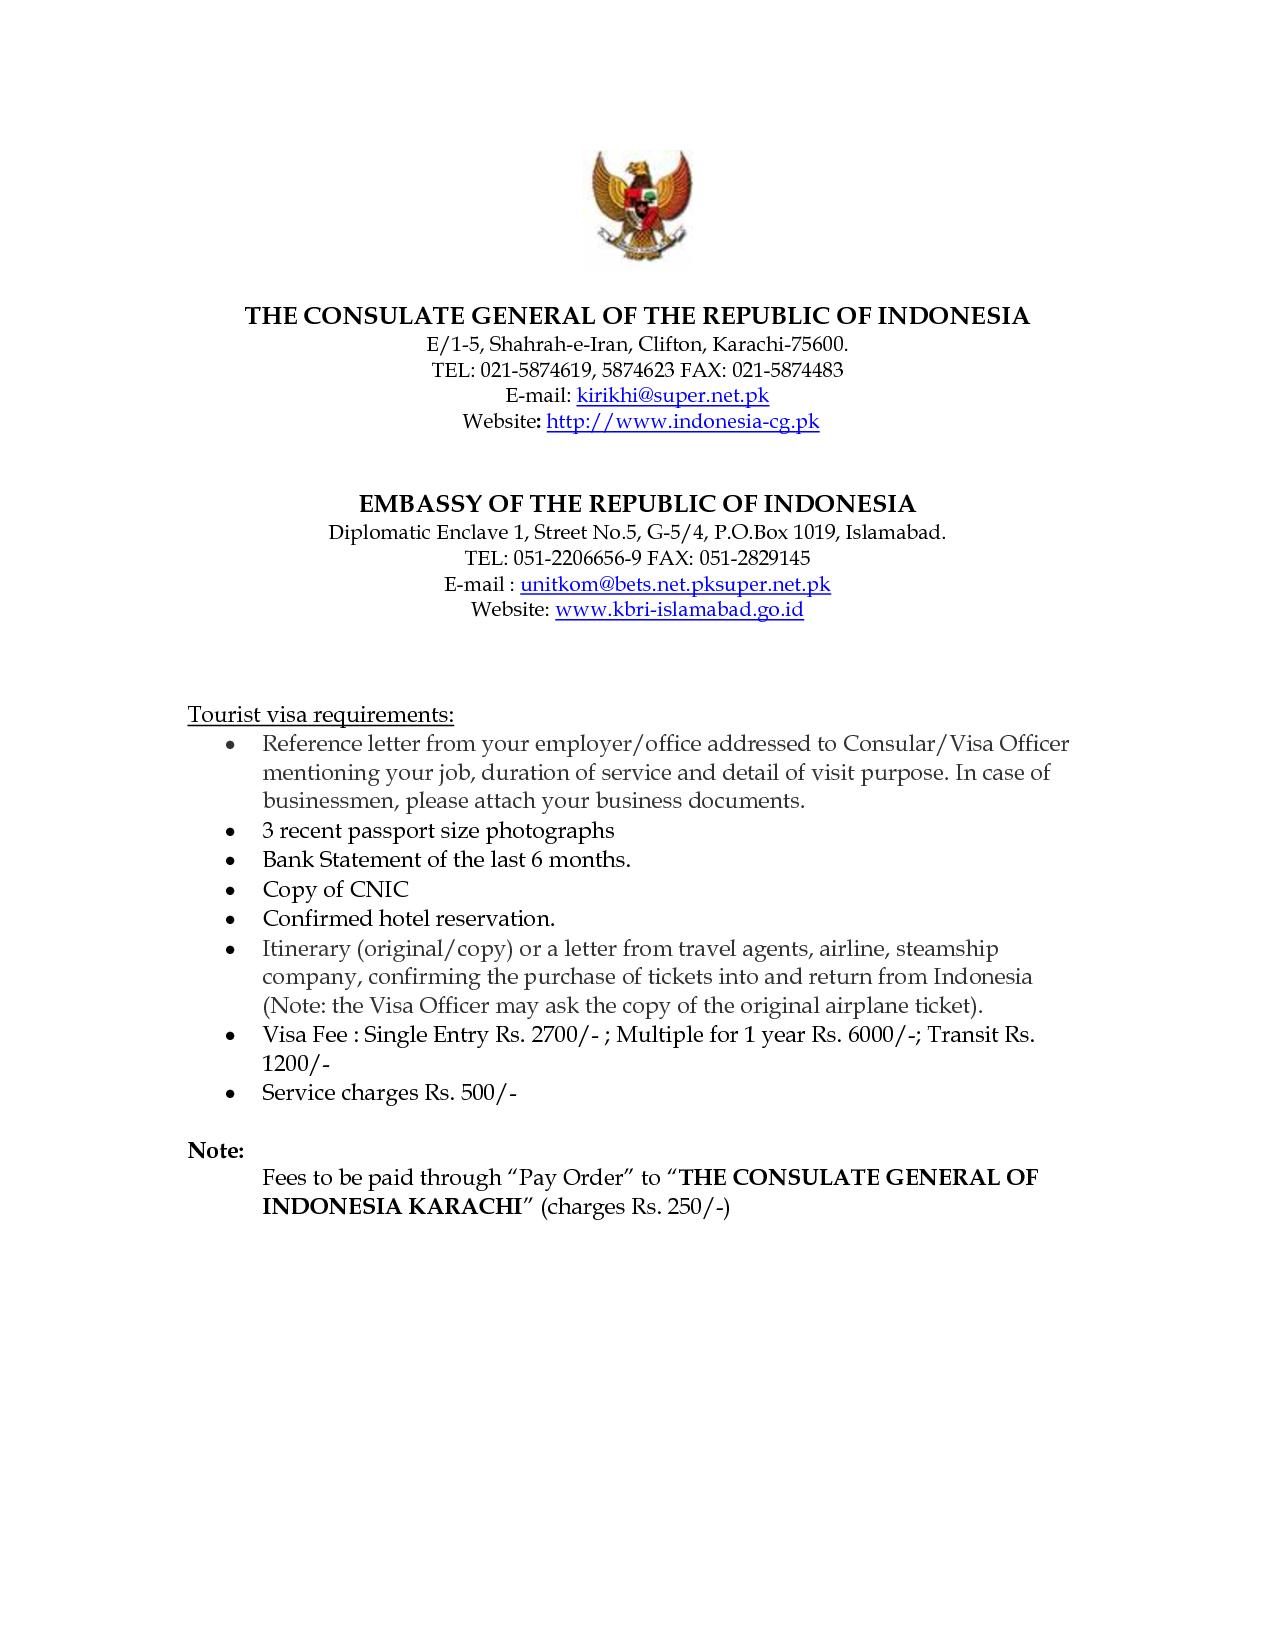 Resume Financial Guarantee Letter For Visa Format Template Jobvisa Application  Letter Application Letter Sample